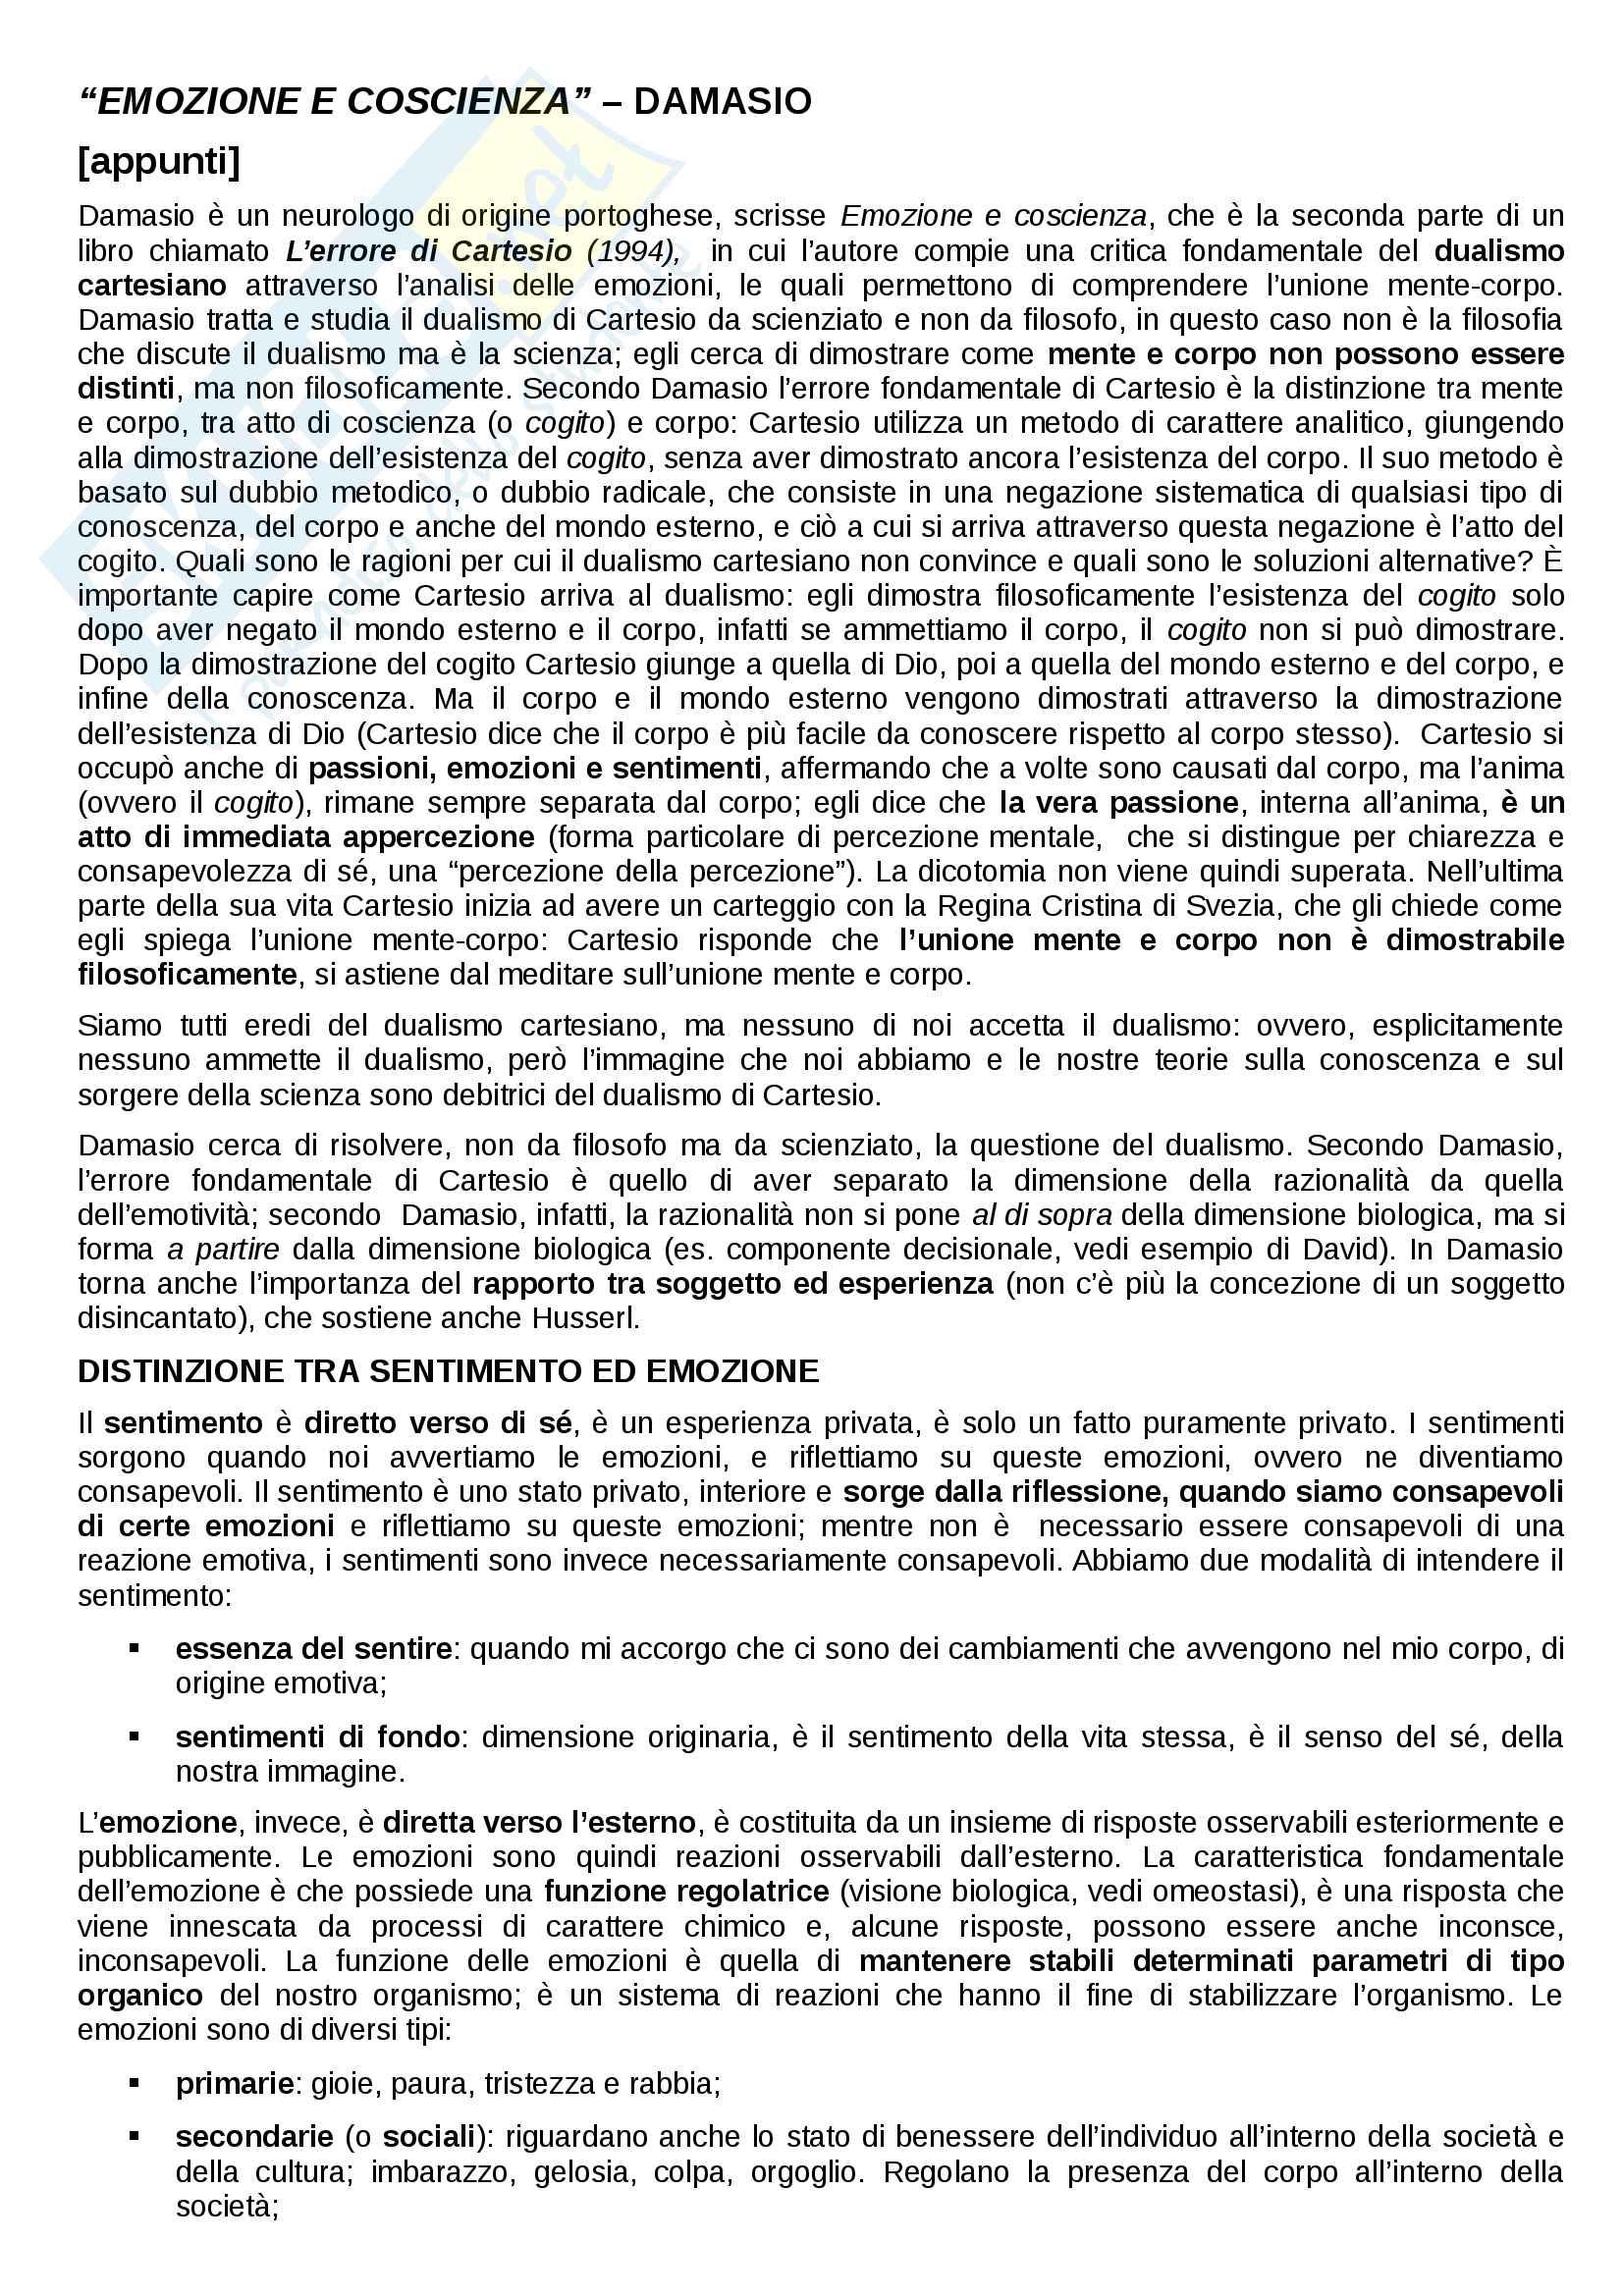 Riassunto esame Storia del pensiero filosofico e scientifico, prof. Malaguti e Formisano